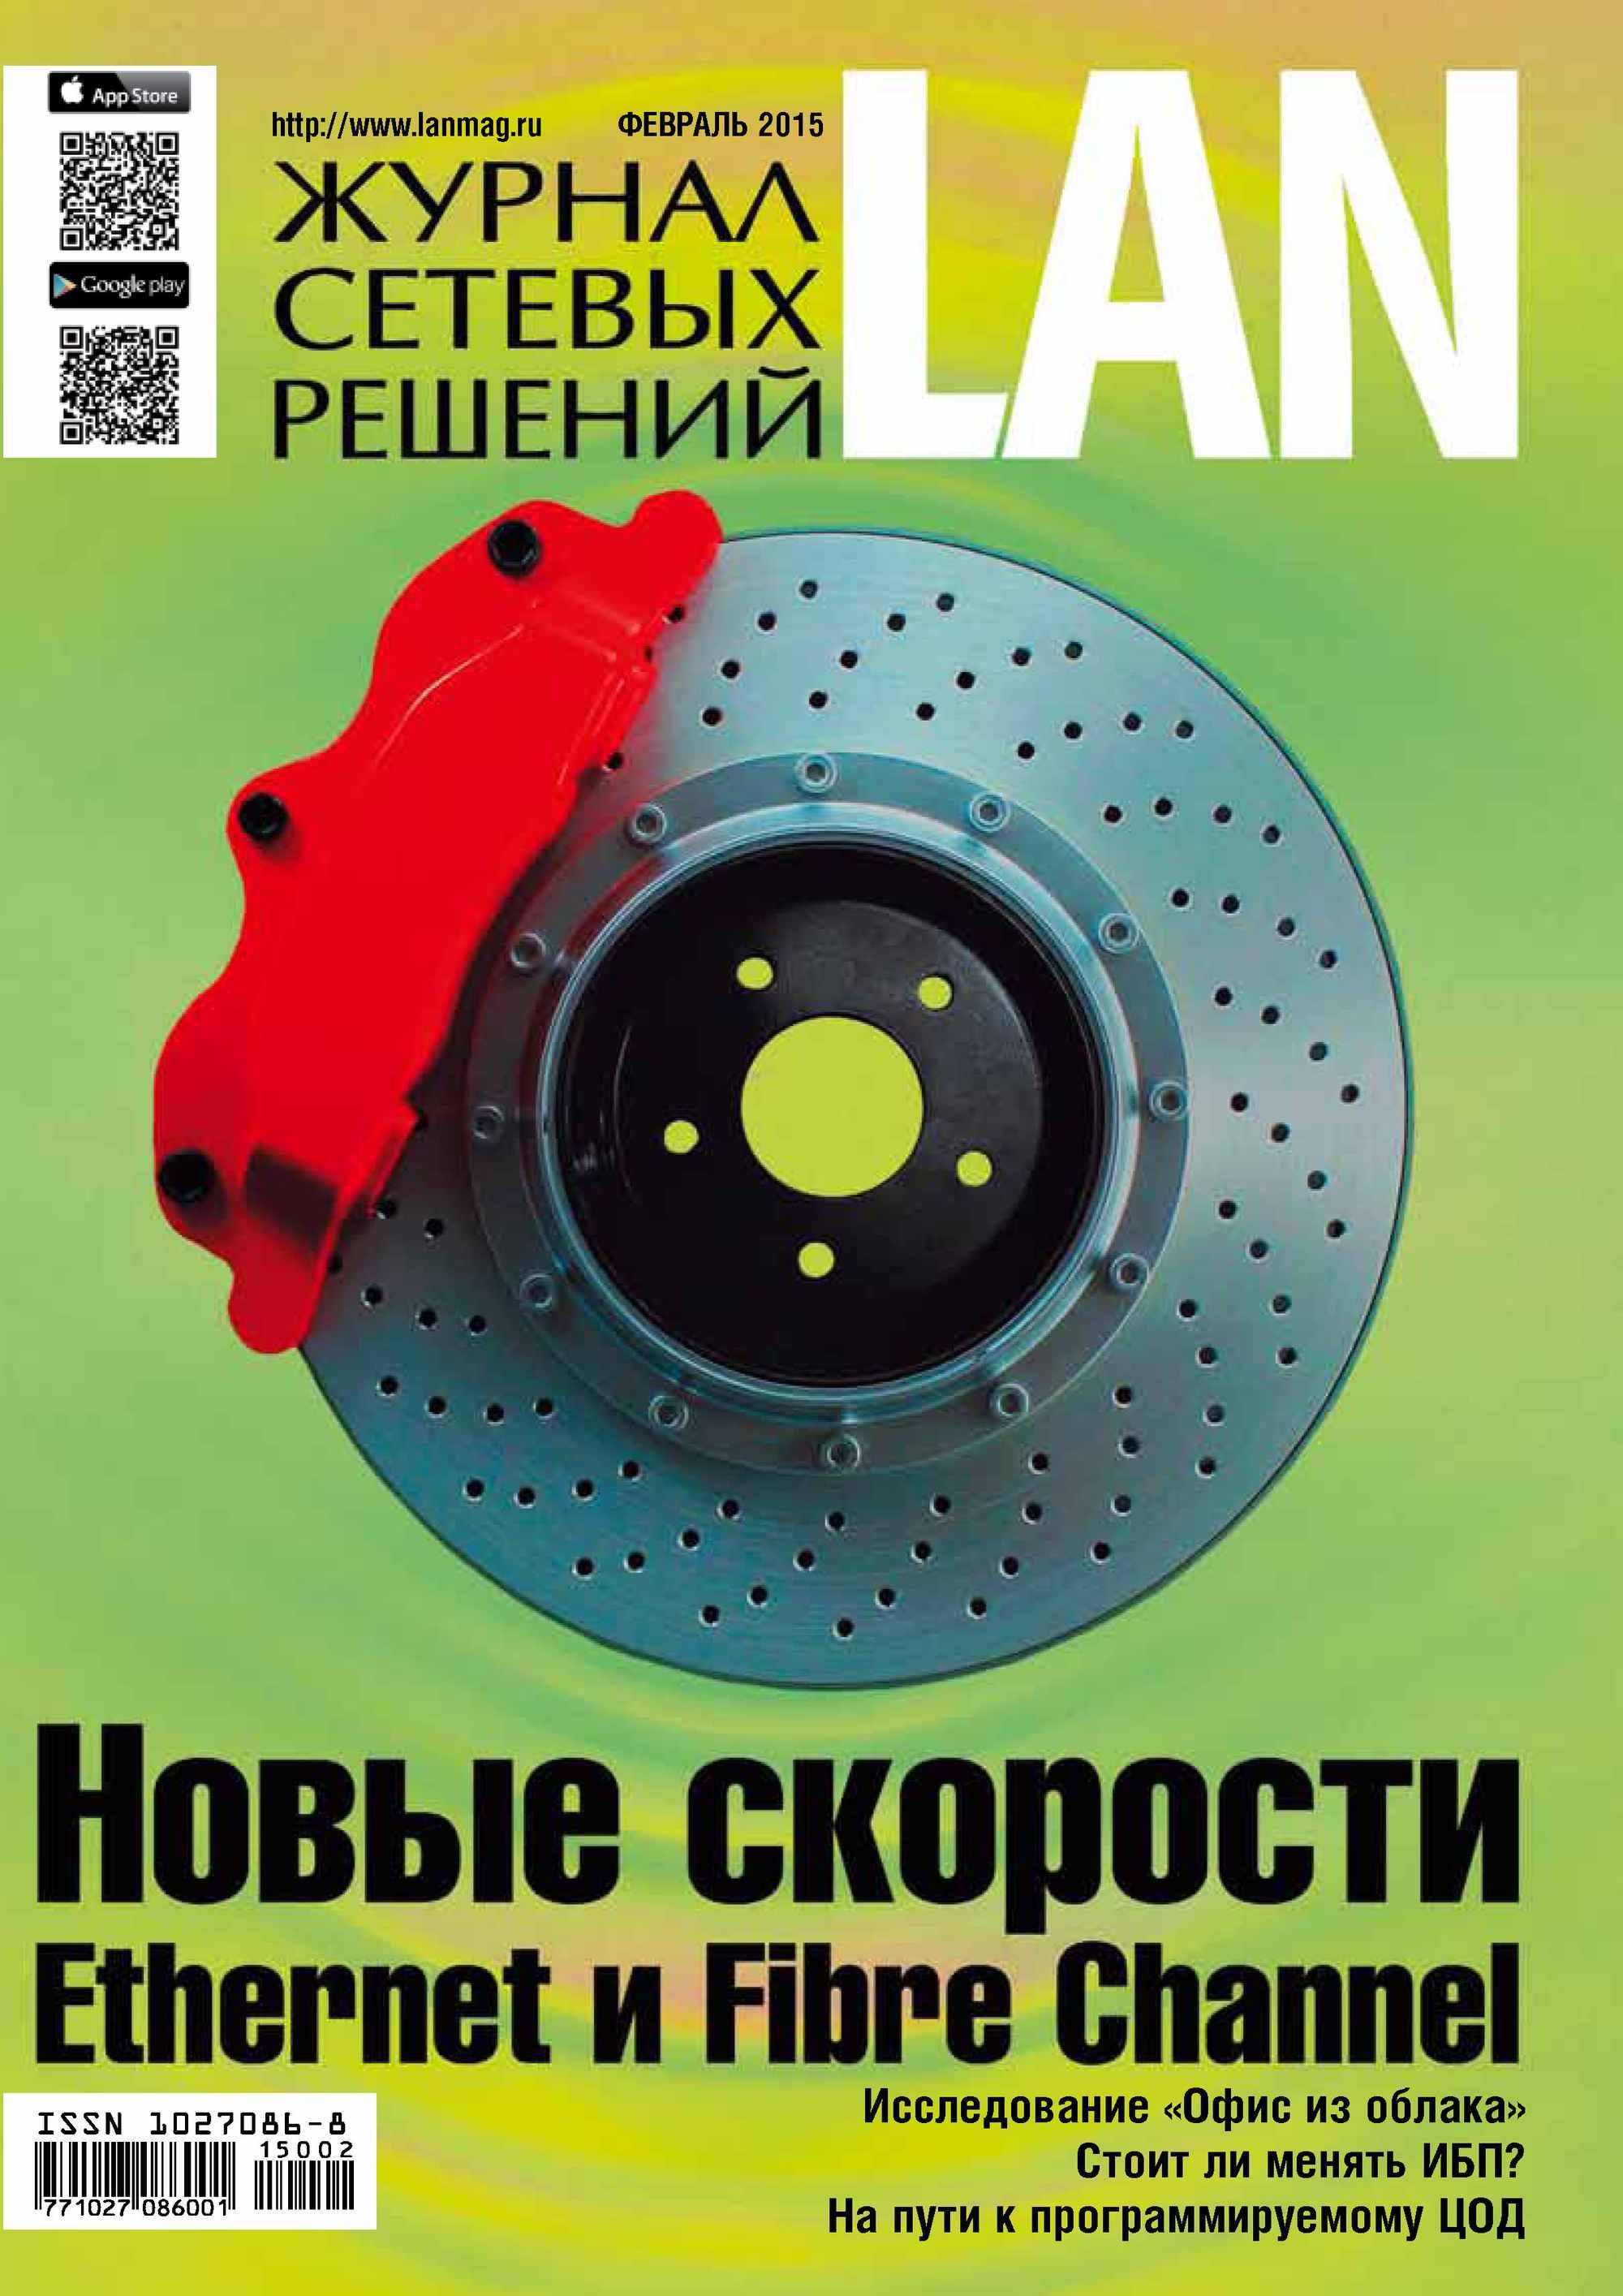 Журнал сетевых решений / LAN №02/2015